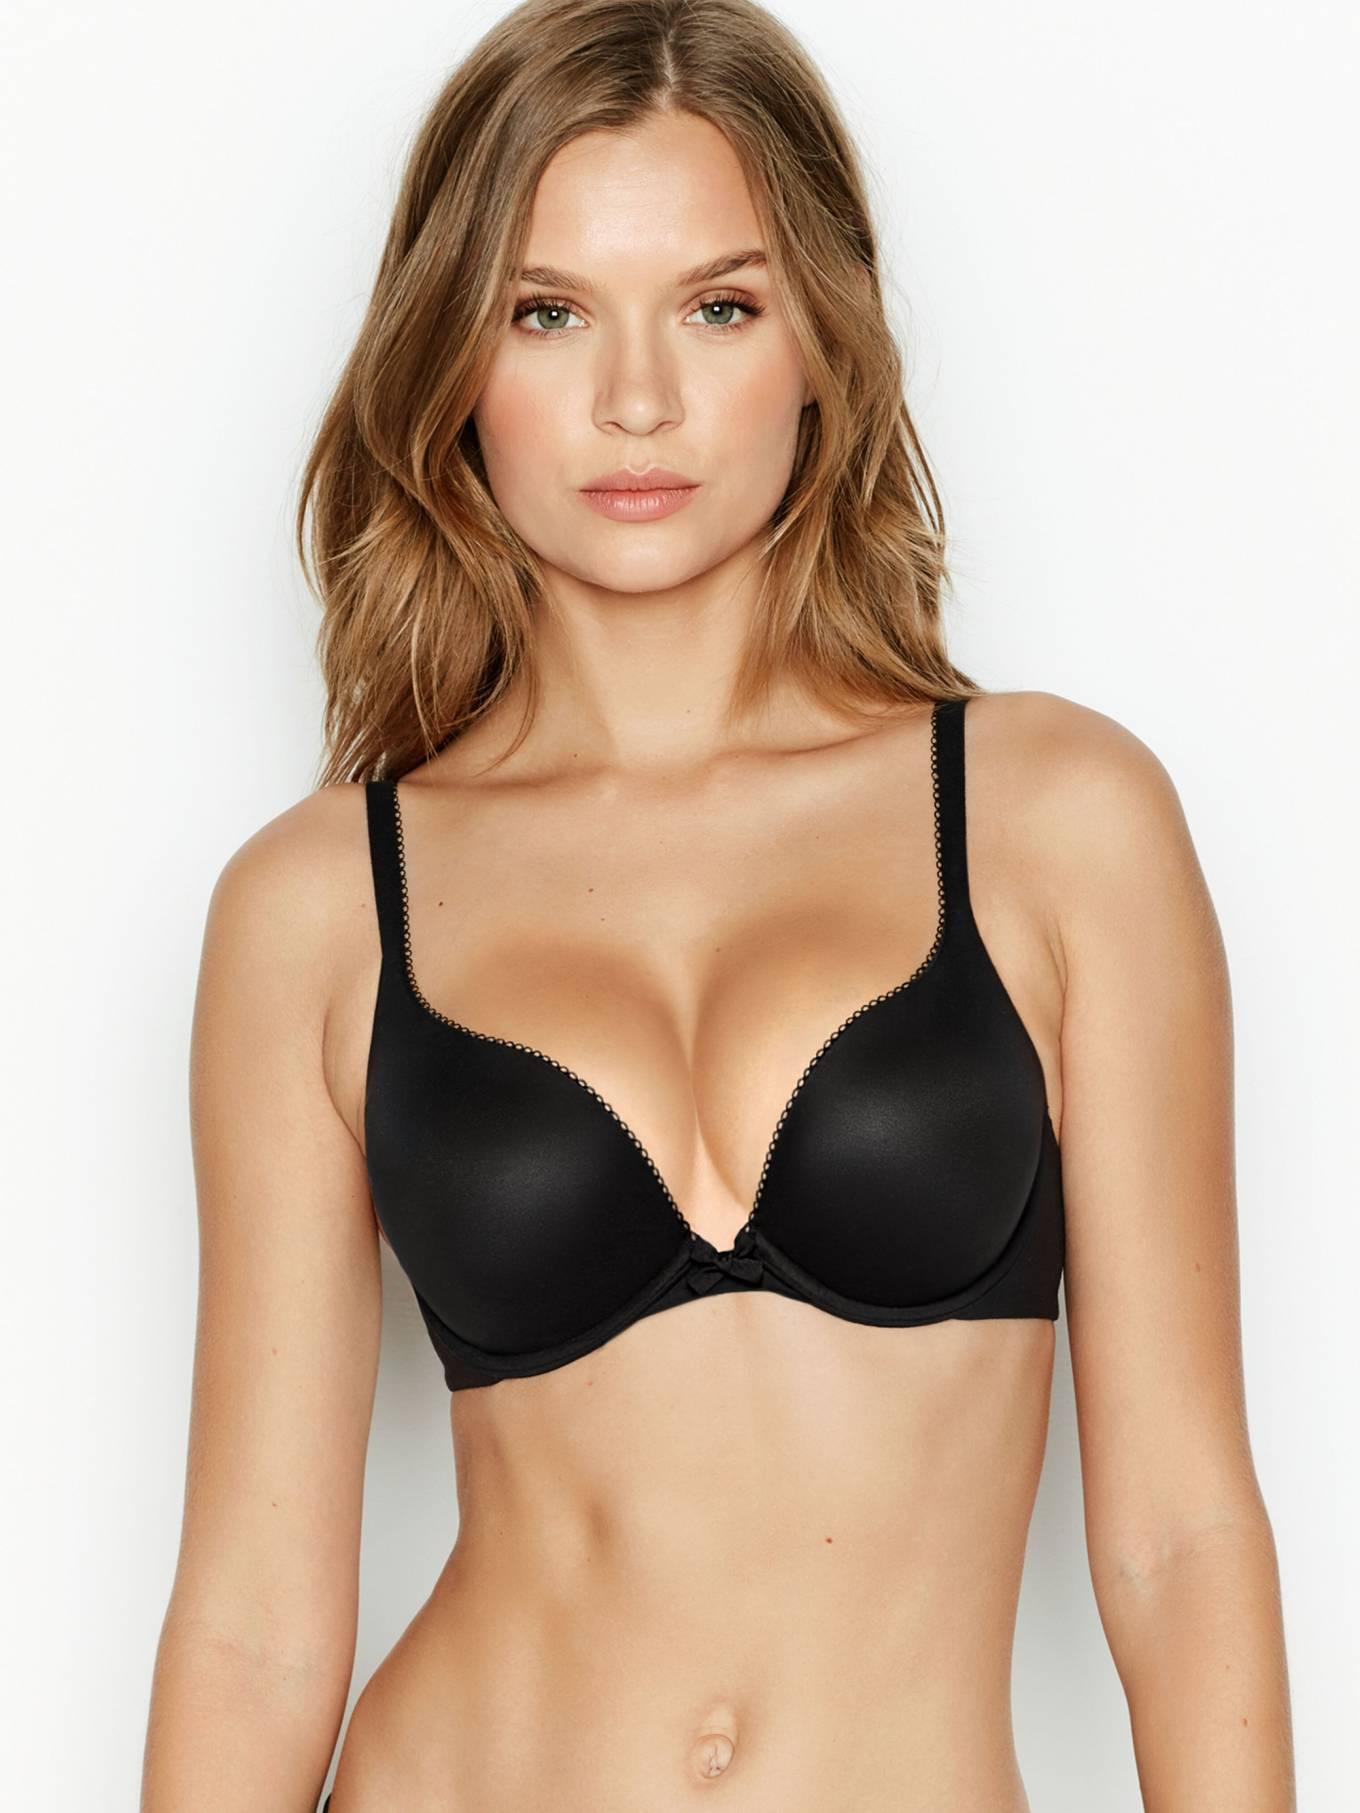 Josephine Skriver 2020 : Josephine Skriver – Victorias Secret (May 2020)-10